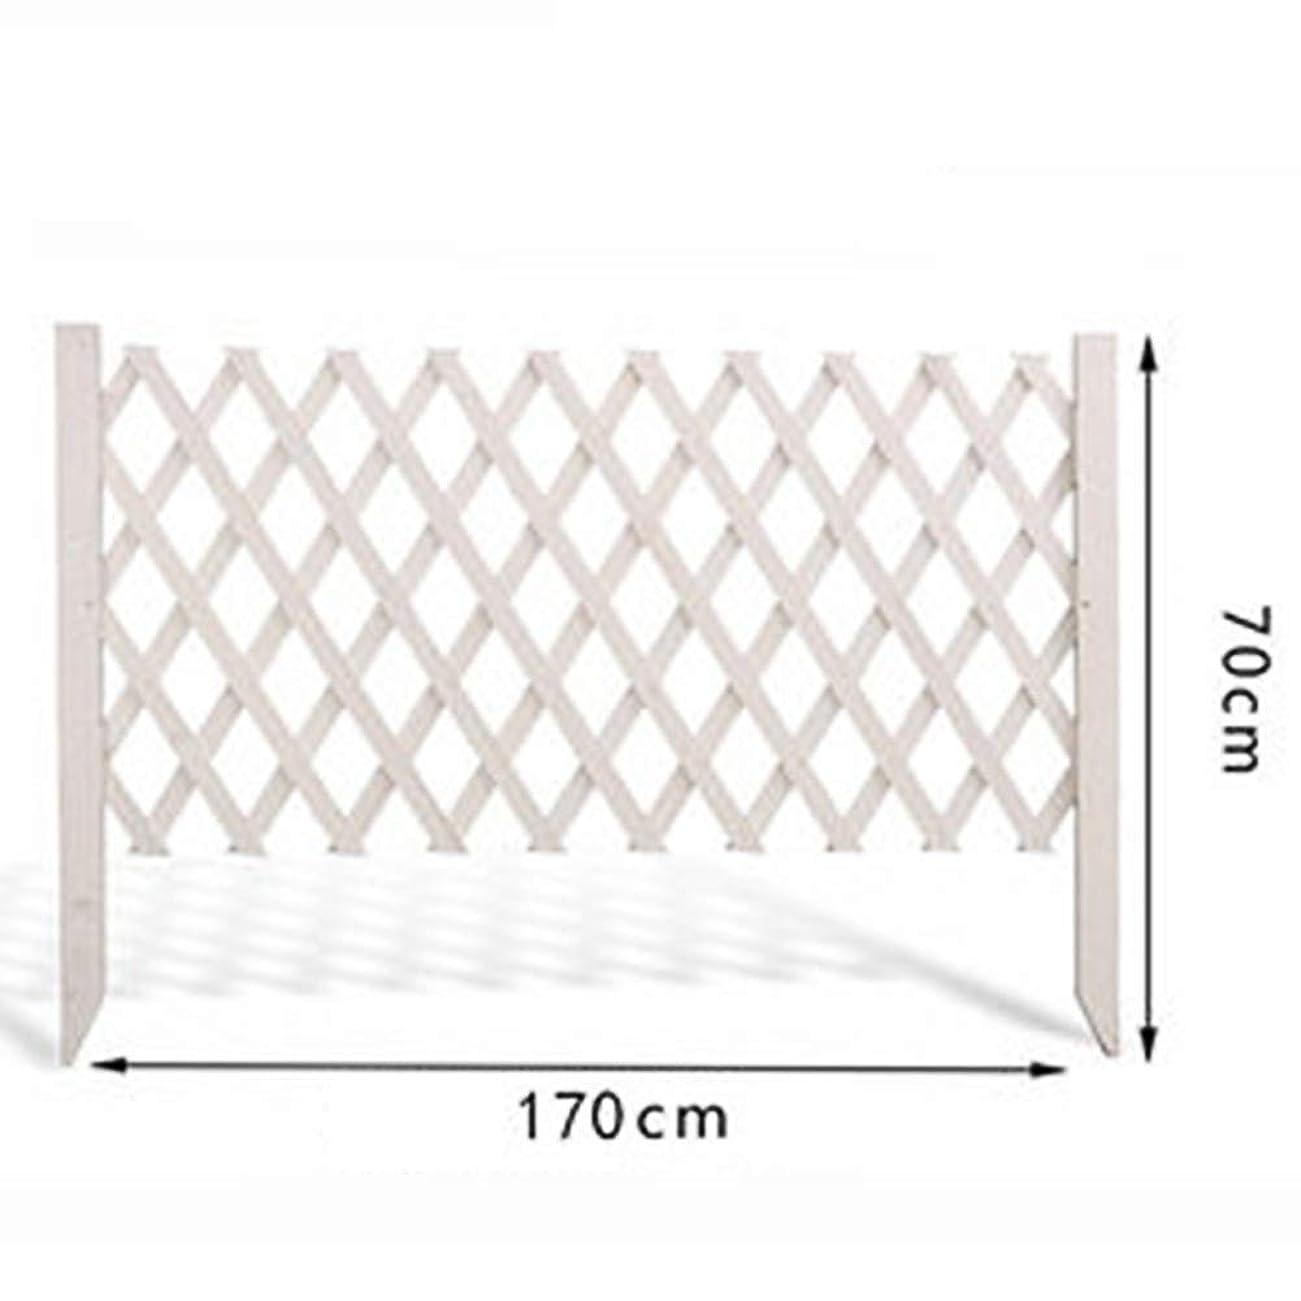 LIXIONG ボーダーフェンス ガーデンフェンス屋外の 拡大する フェンス デコレーション 工場 ピケット フェンシング 木製 工場 柵 にとって 中庭 花 植付、 3サイズ (Color : White, Size : 170x70cm)